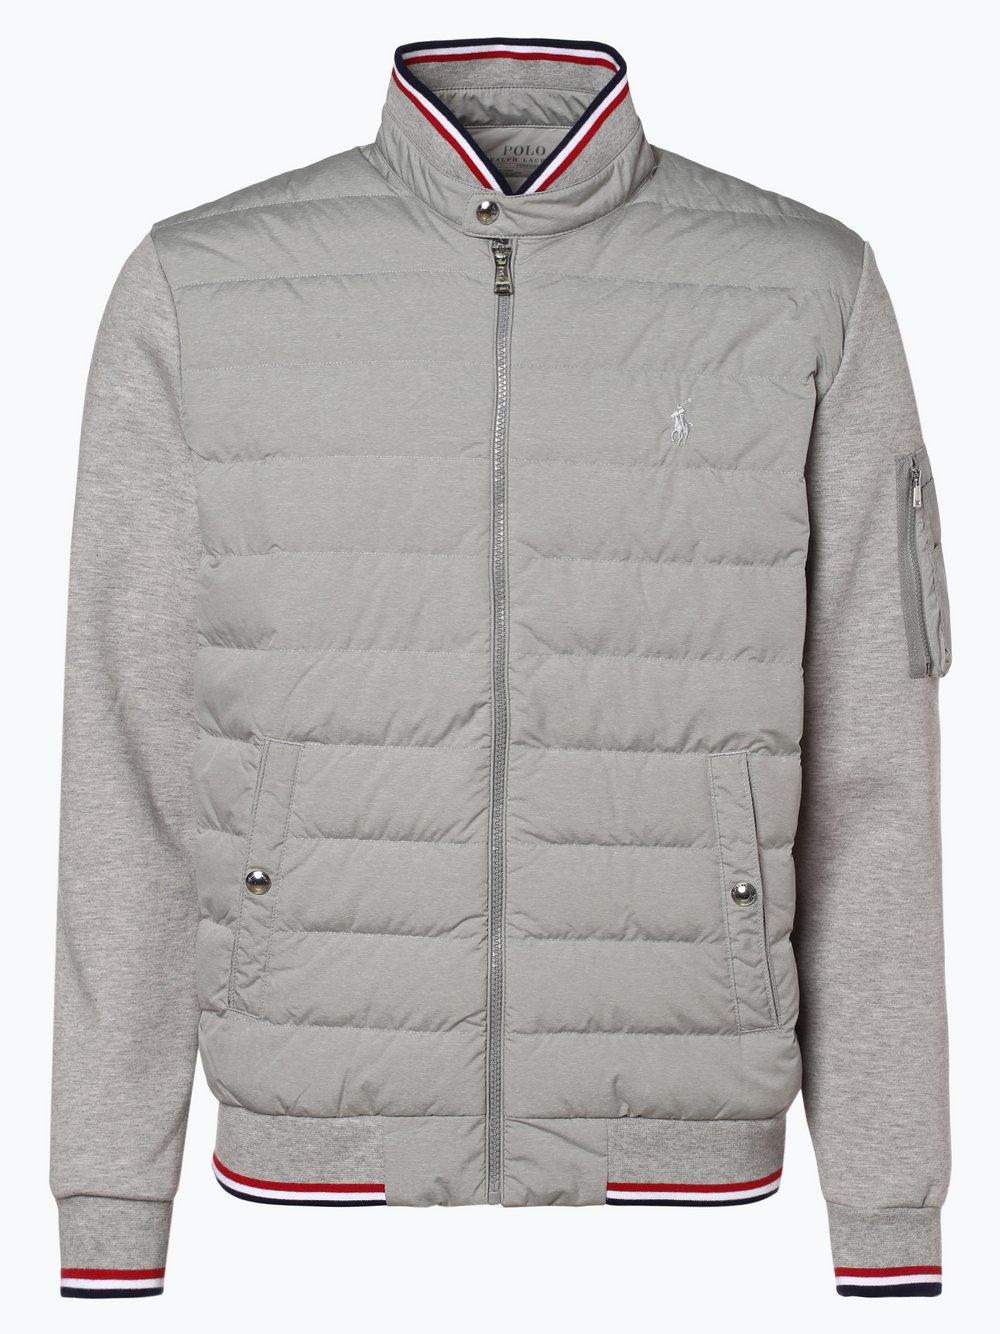 cab12343fab84a Polo Ralph Lauren Herren Daunenjacke online kaufen